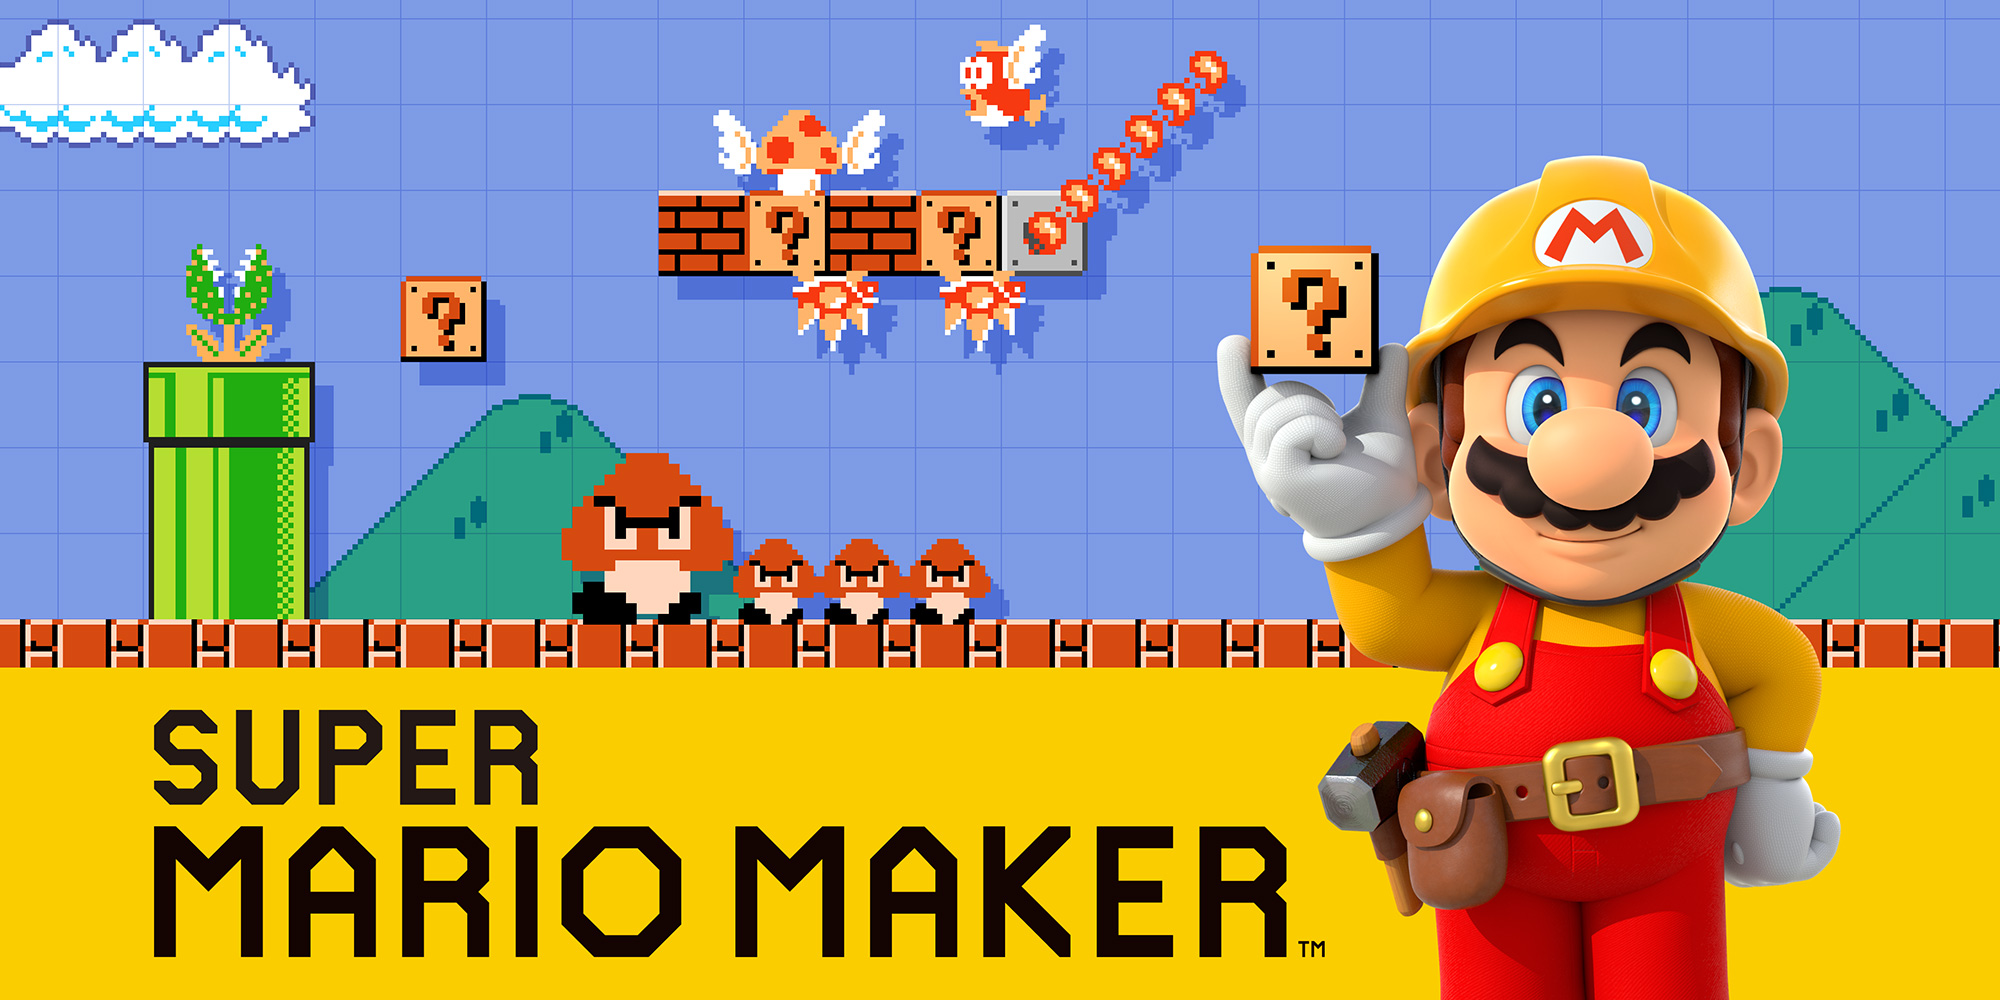 http://cdn02.nintendo-europe.com/media/images/10_share_images/games_15/wiiu_14/SI_WiiU_SuperMarioMaker_v01.jpg